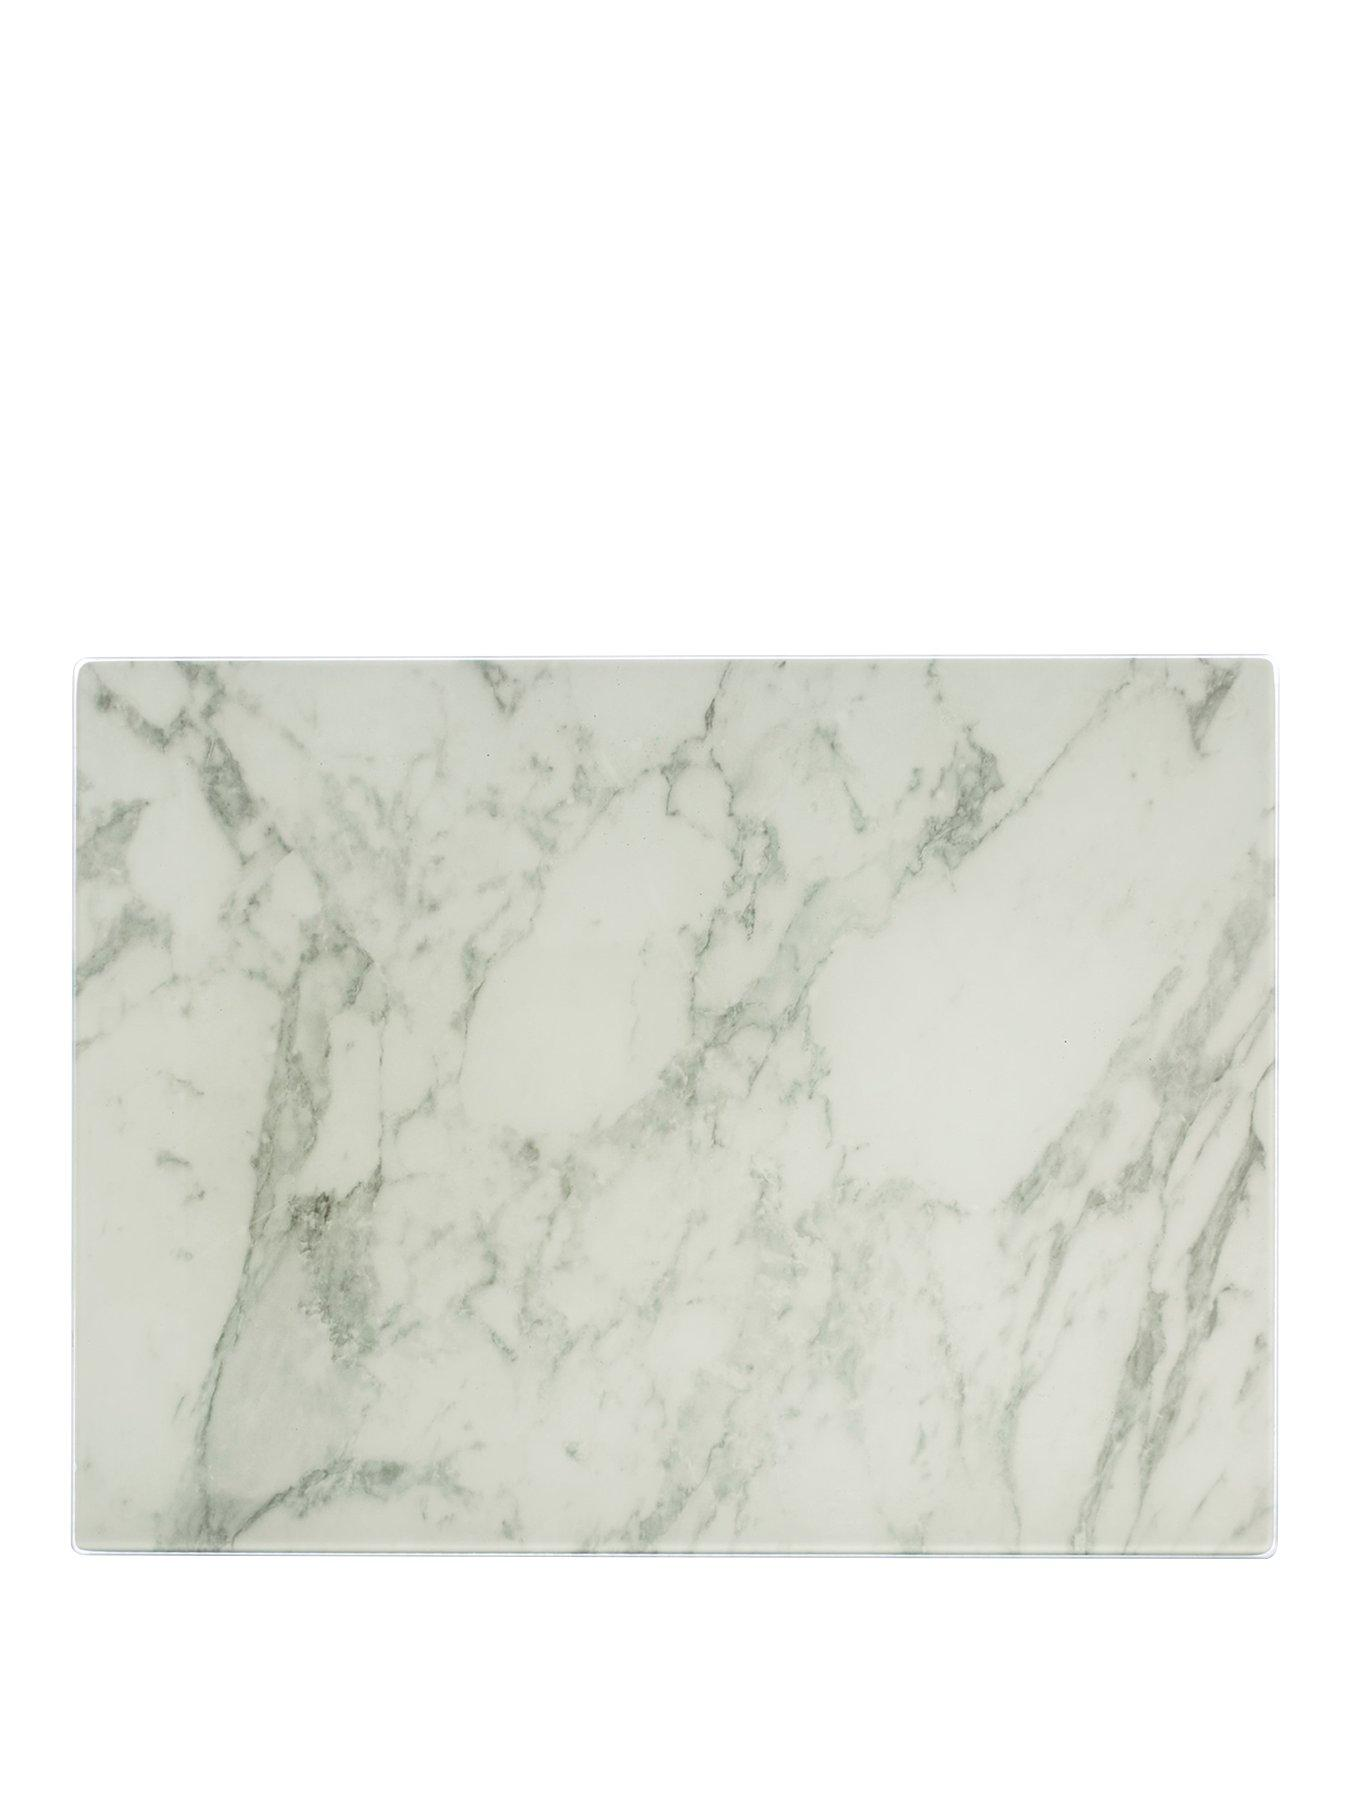 Square Cream Glass Worktop Saver 40 x 40cm